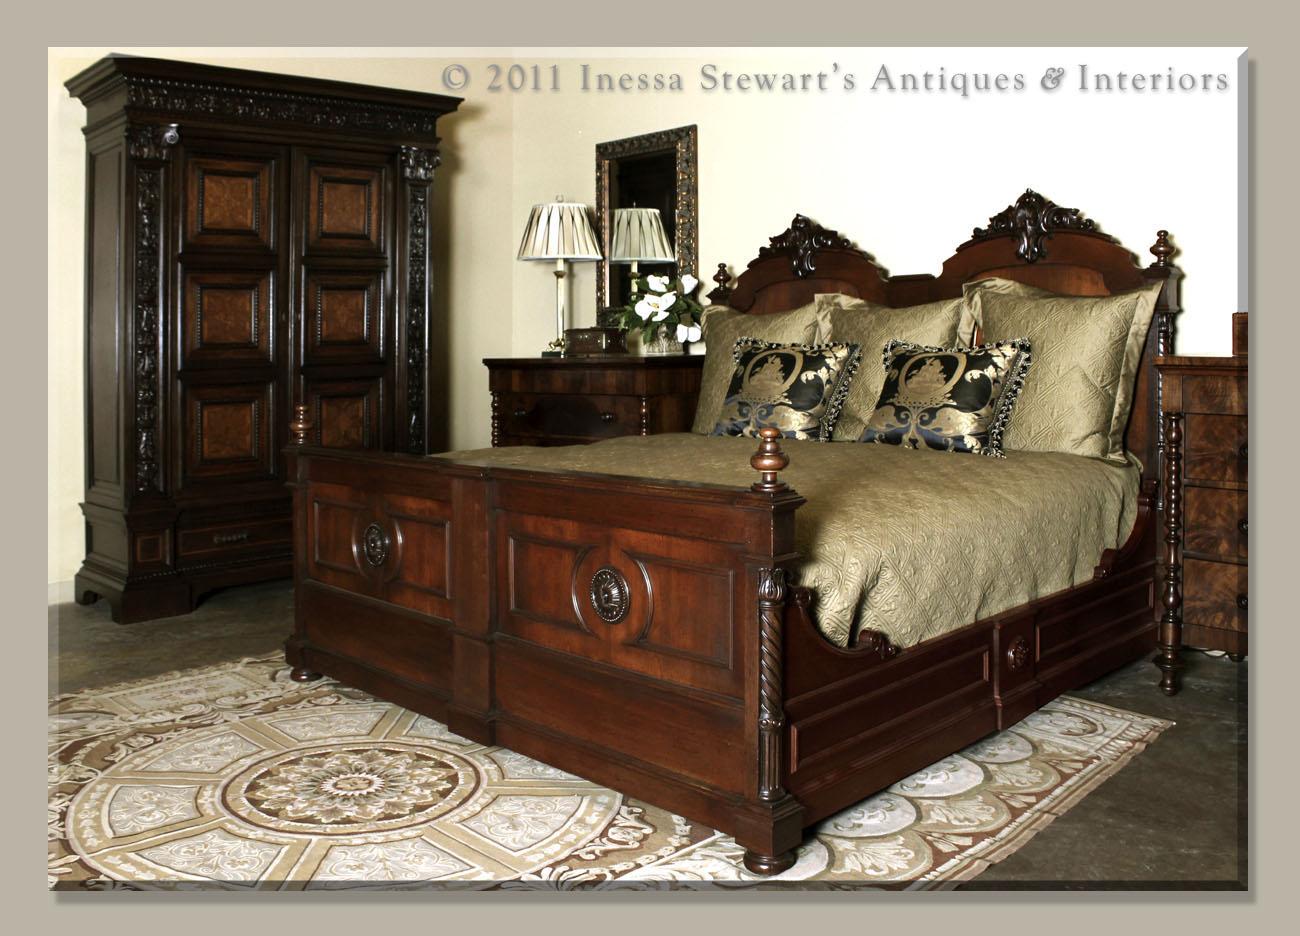 Antique Beds Amp Bedrooms Historical Origins Antiques In